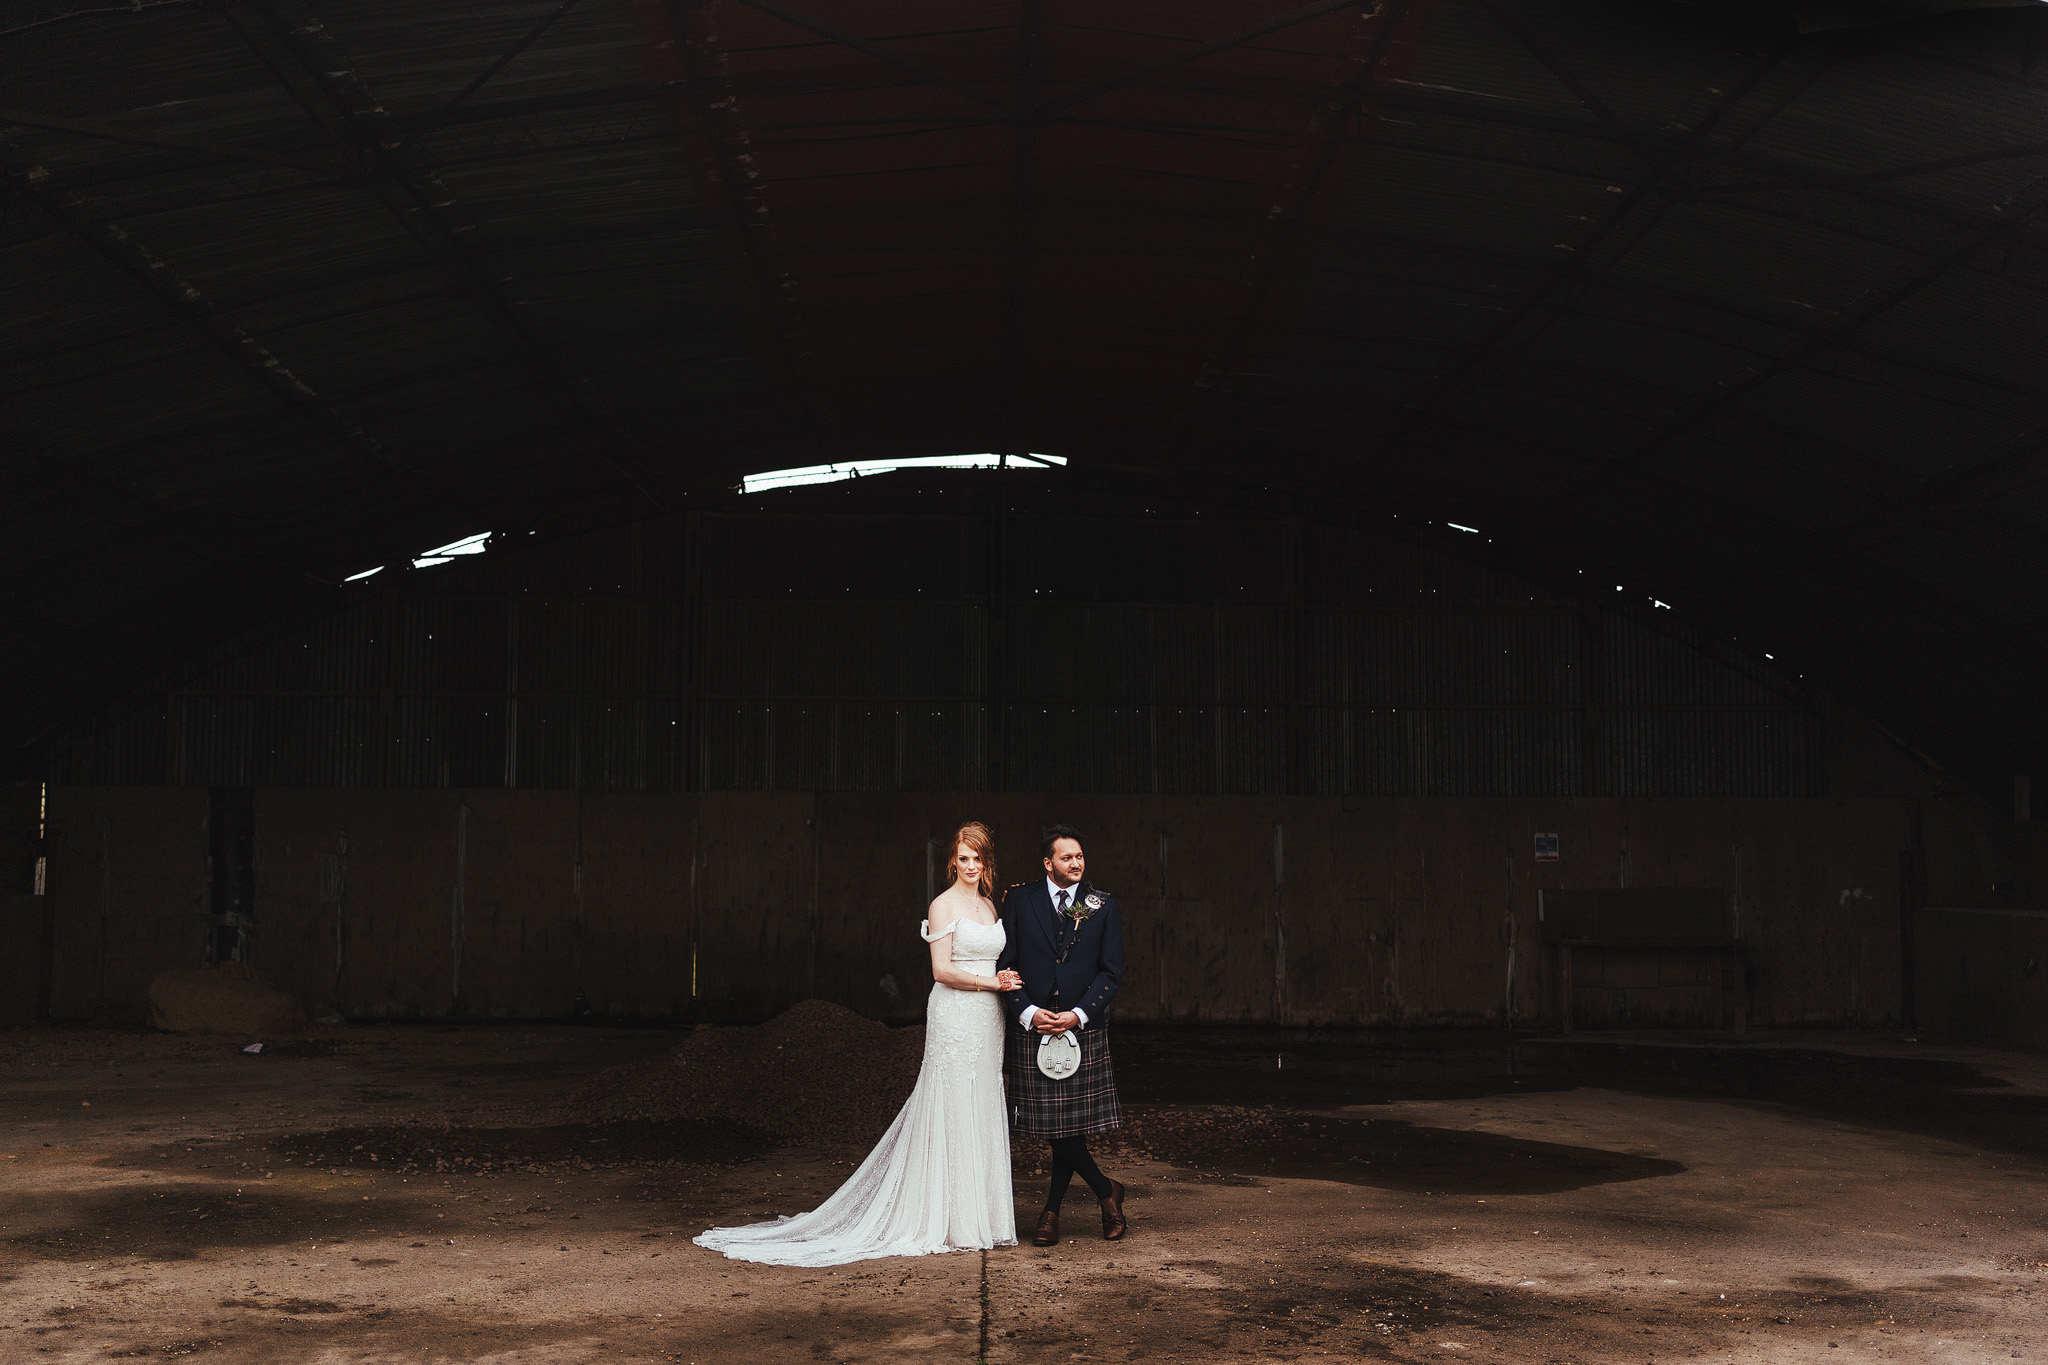 Wedding Photographer Of The Year 2020031